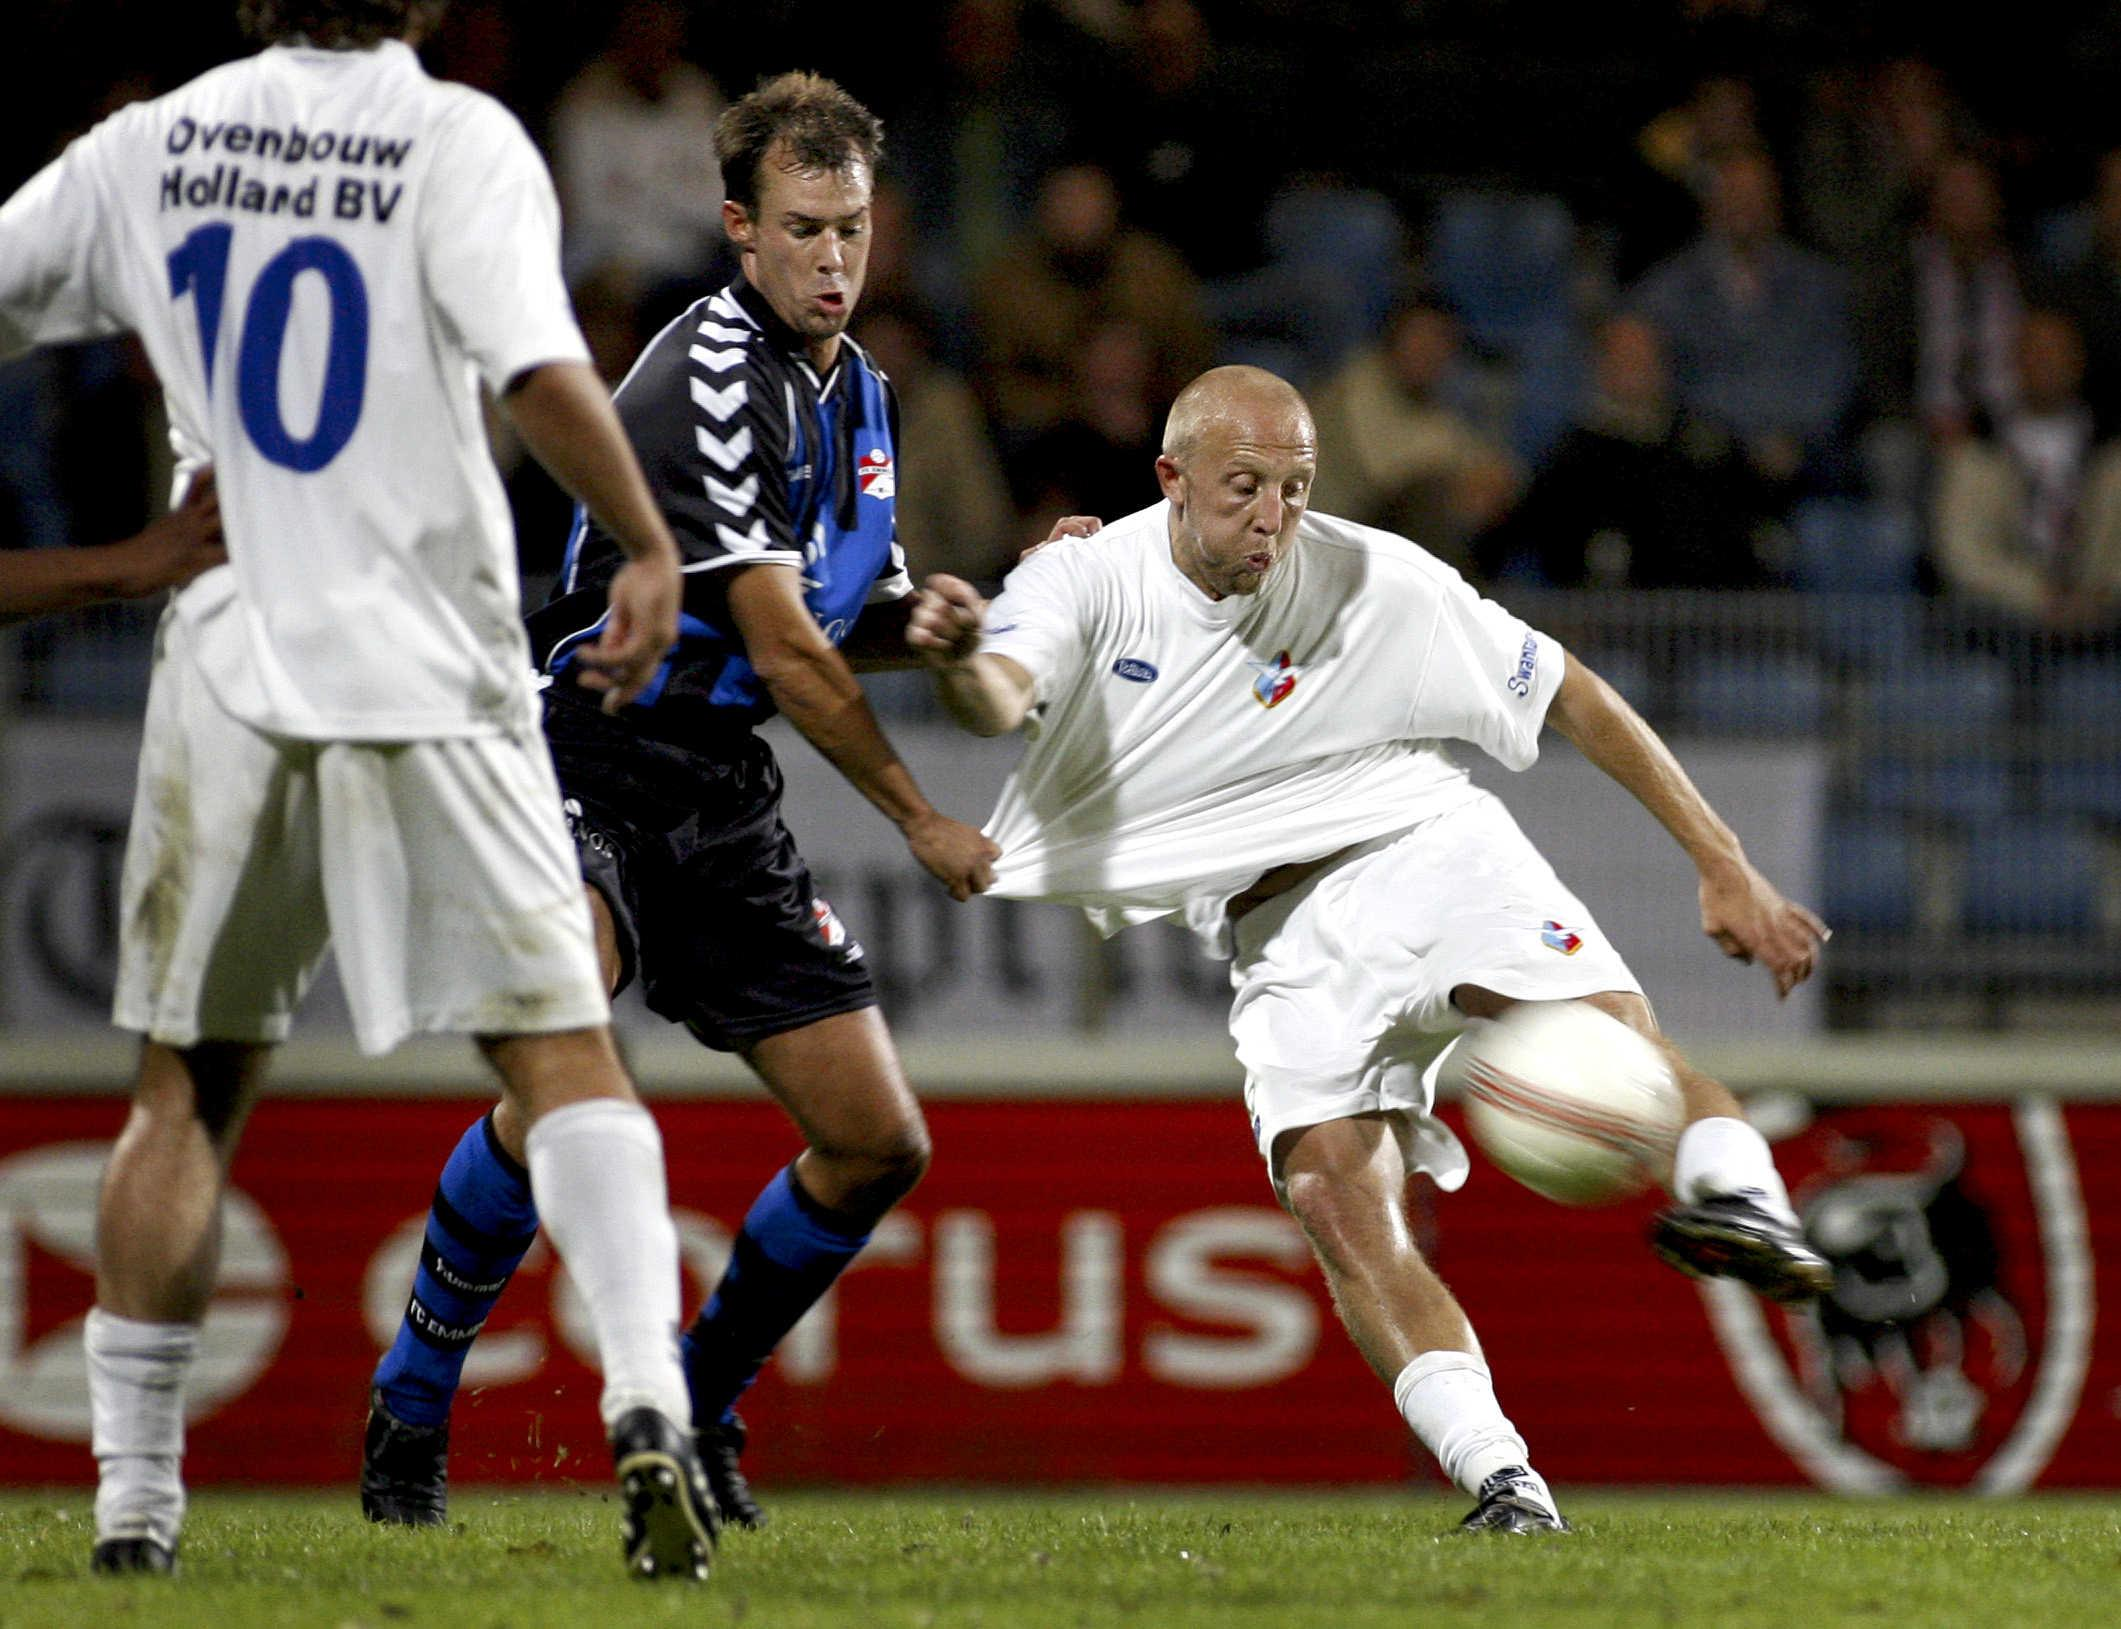 Oud-voetballer Johan Pater ligt in coma